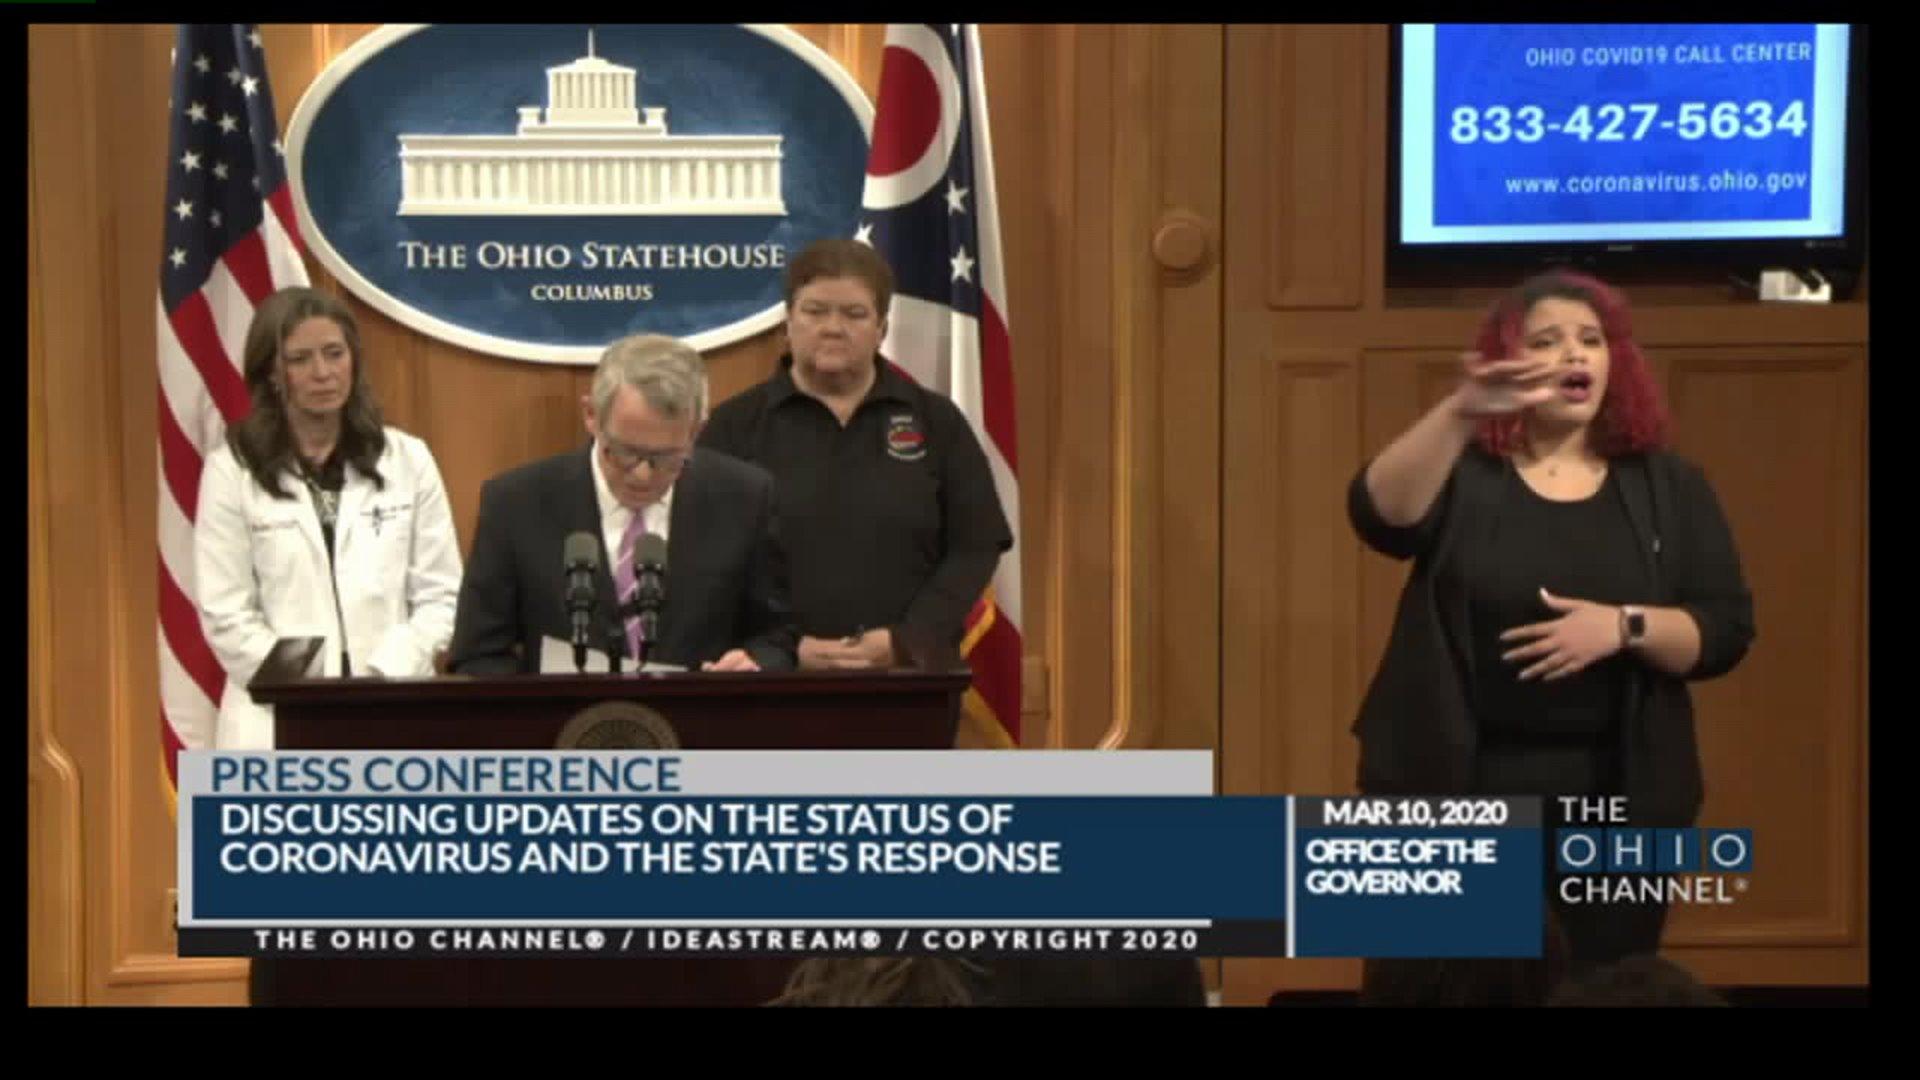 Gov. DeWine to give update on coronavirus in Ohio